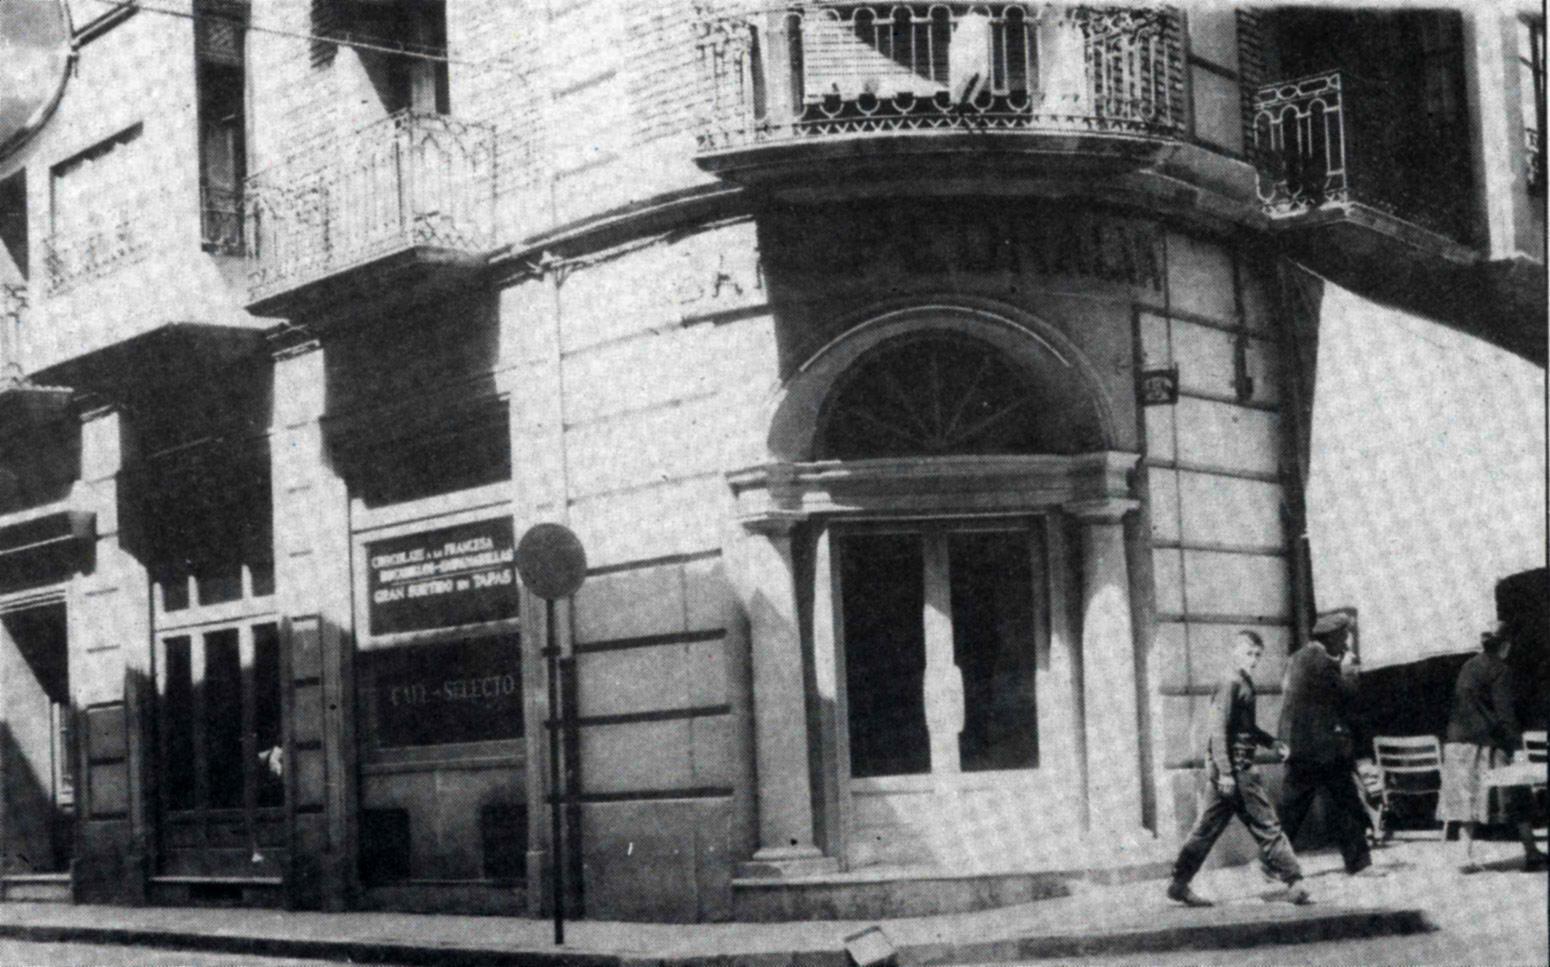 Teruel en un siglo comparaci n entre fotograf a antigua 1 for Utilidad del marmol